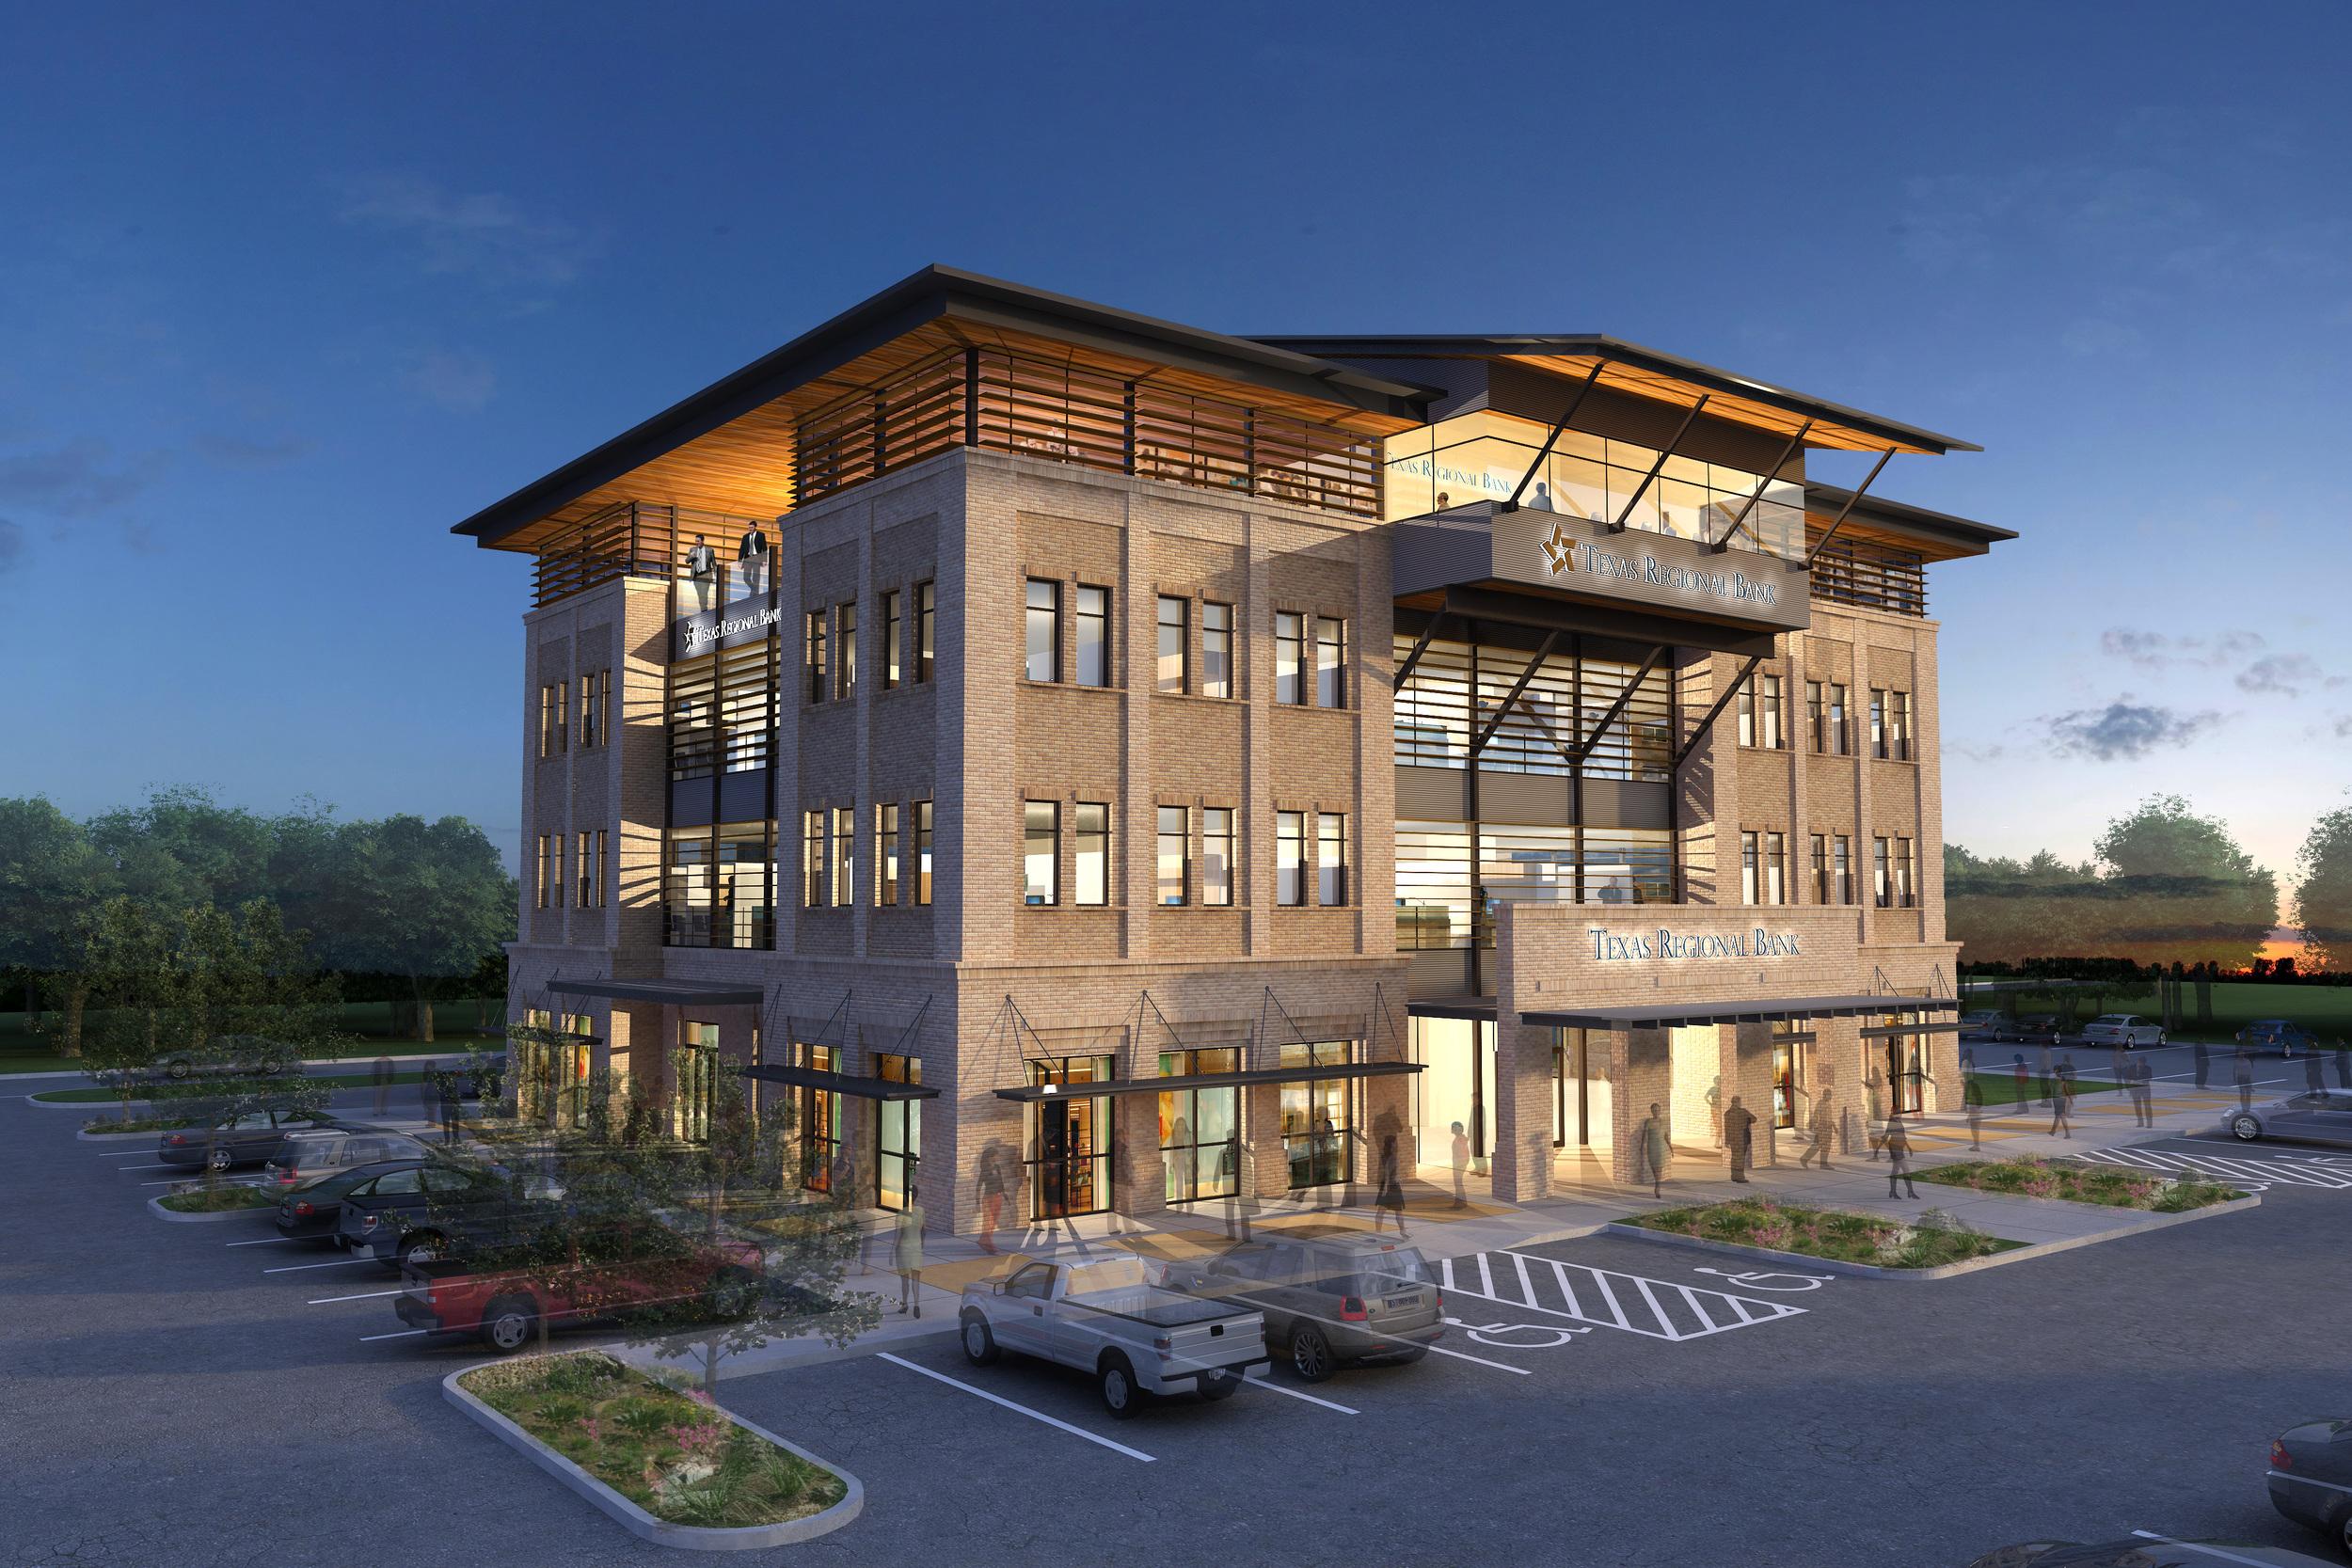 Texas Regional Bank Headquarters